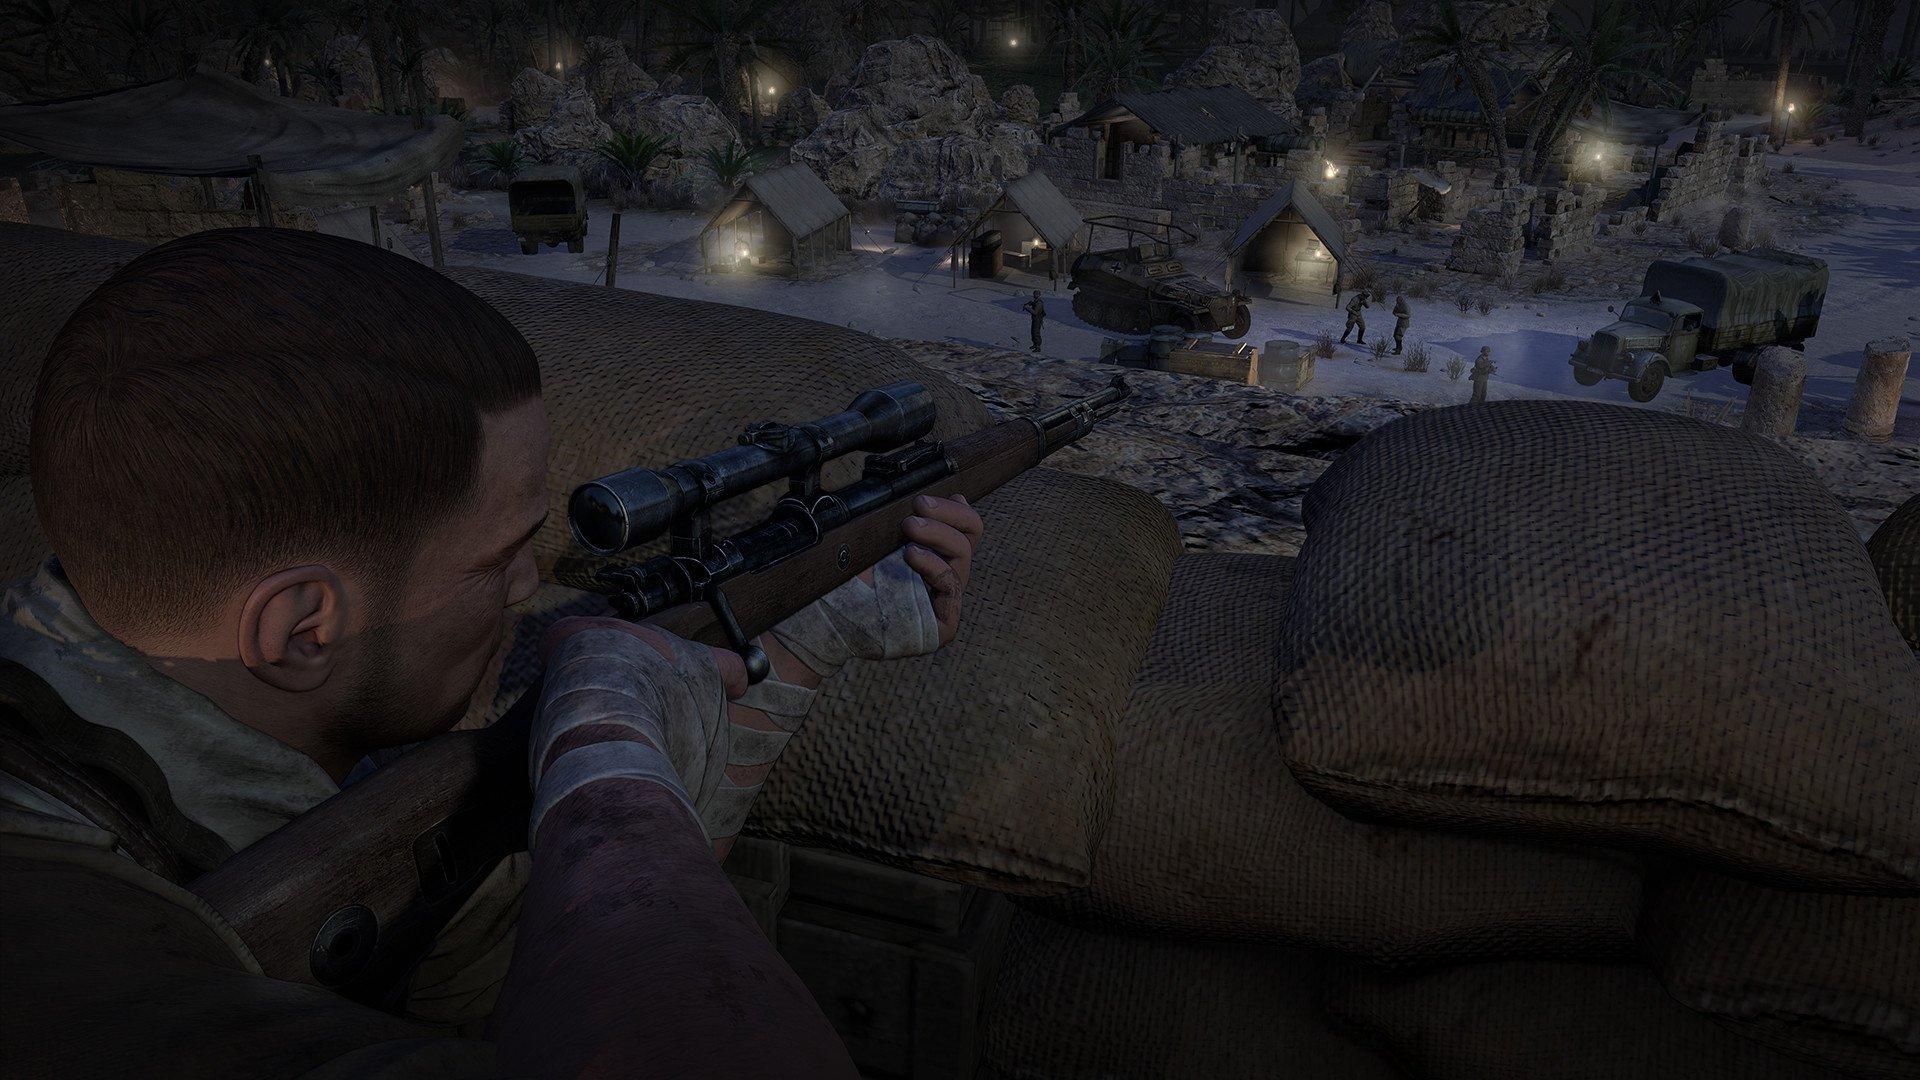 sniper elite 3 2537609 تصاویر جدیدی از Sniper Elite 3 منتشر شد : بیابان گردی در آفریقا